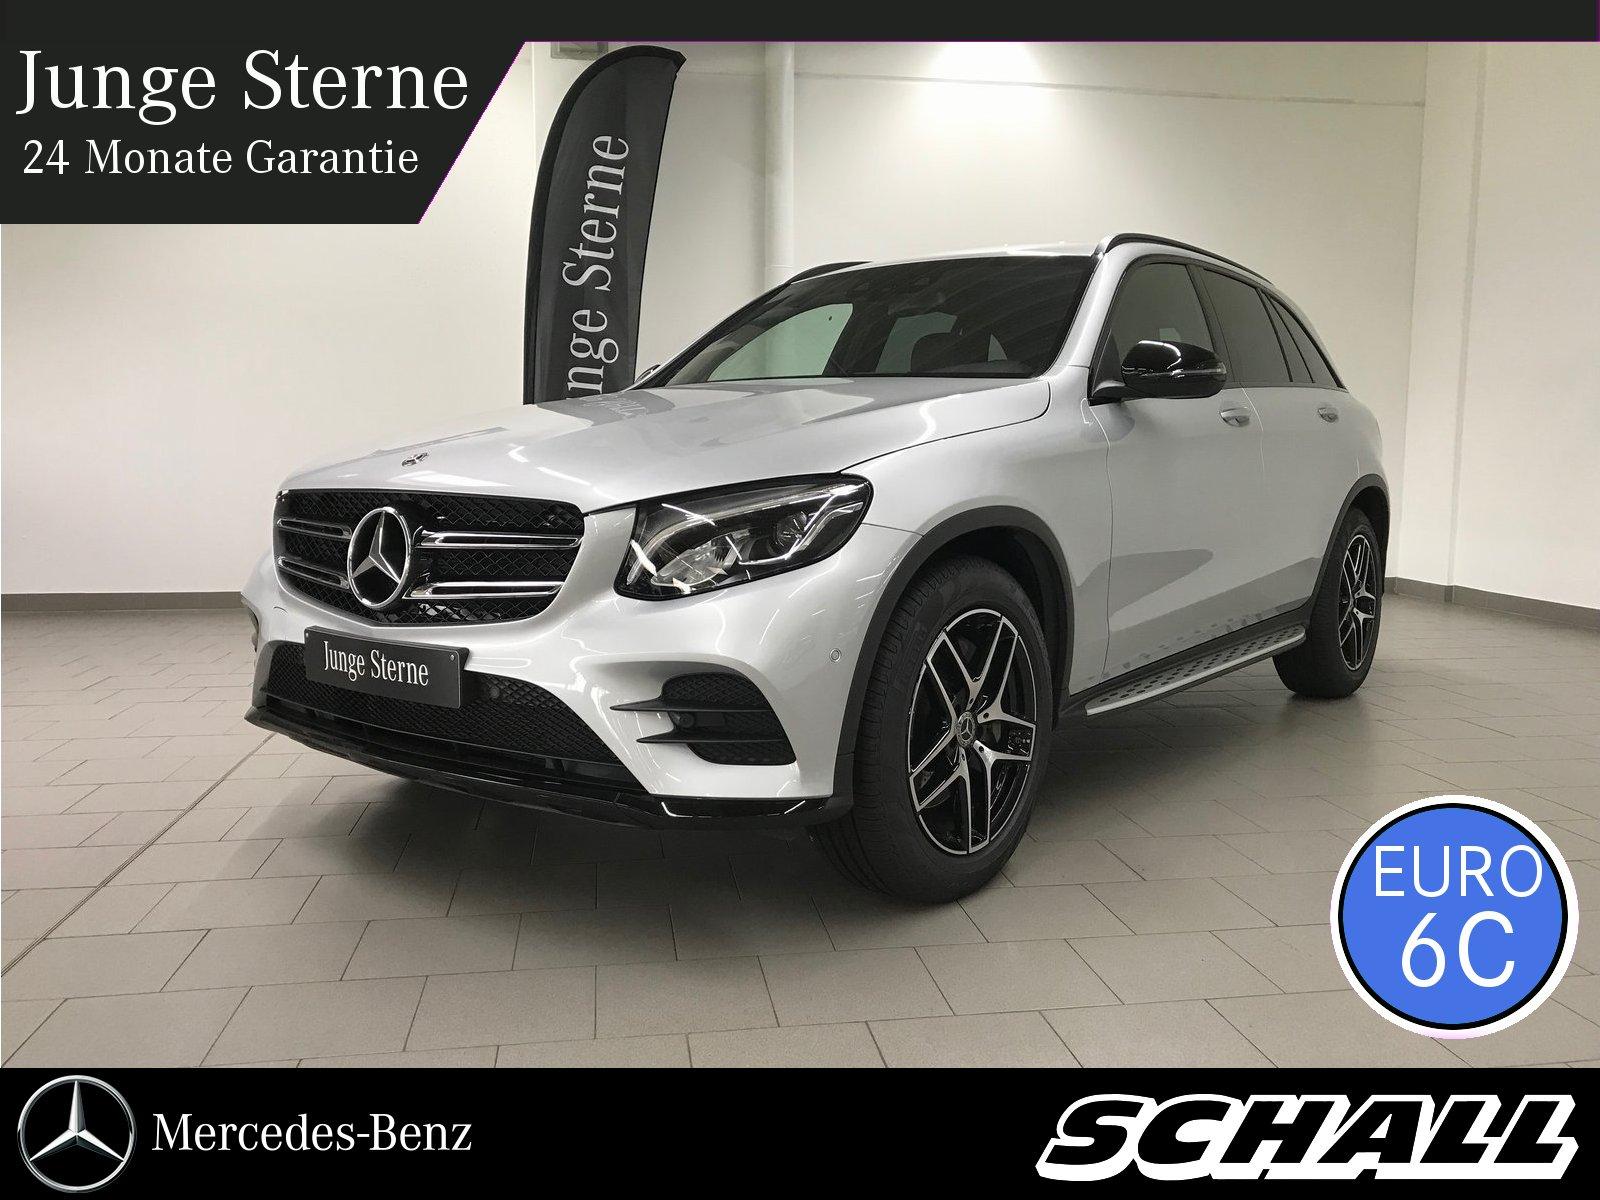 Mercedes-Benz GLC 300 4M AMG/NIGHT/BURMESTER/AHK/LED/KAMERA, Jahr 2018, petrol